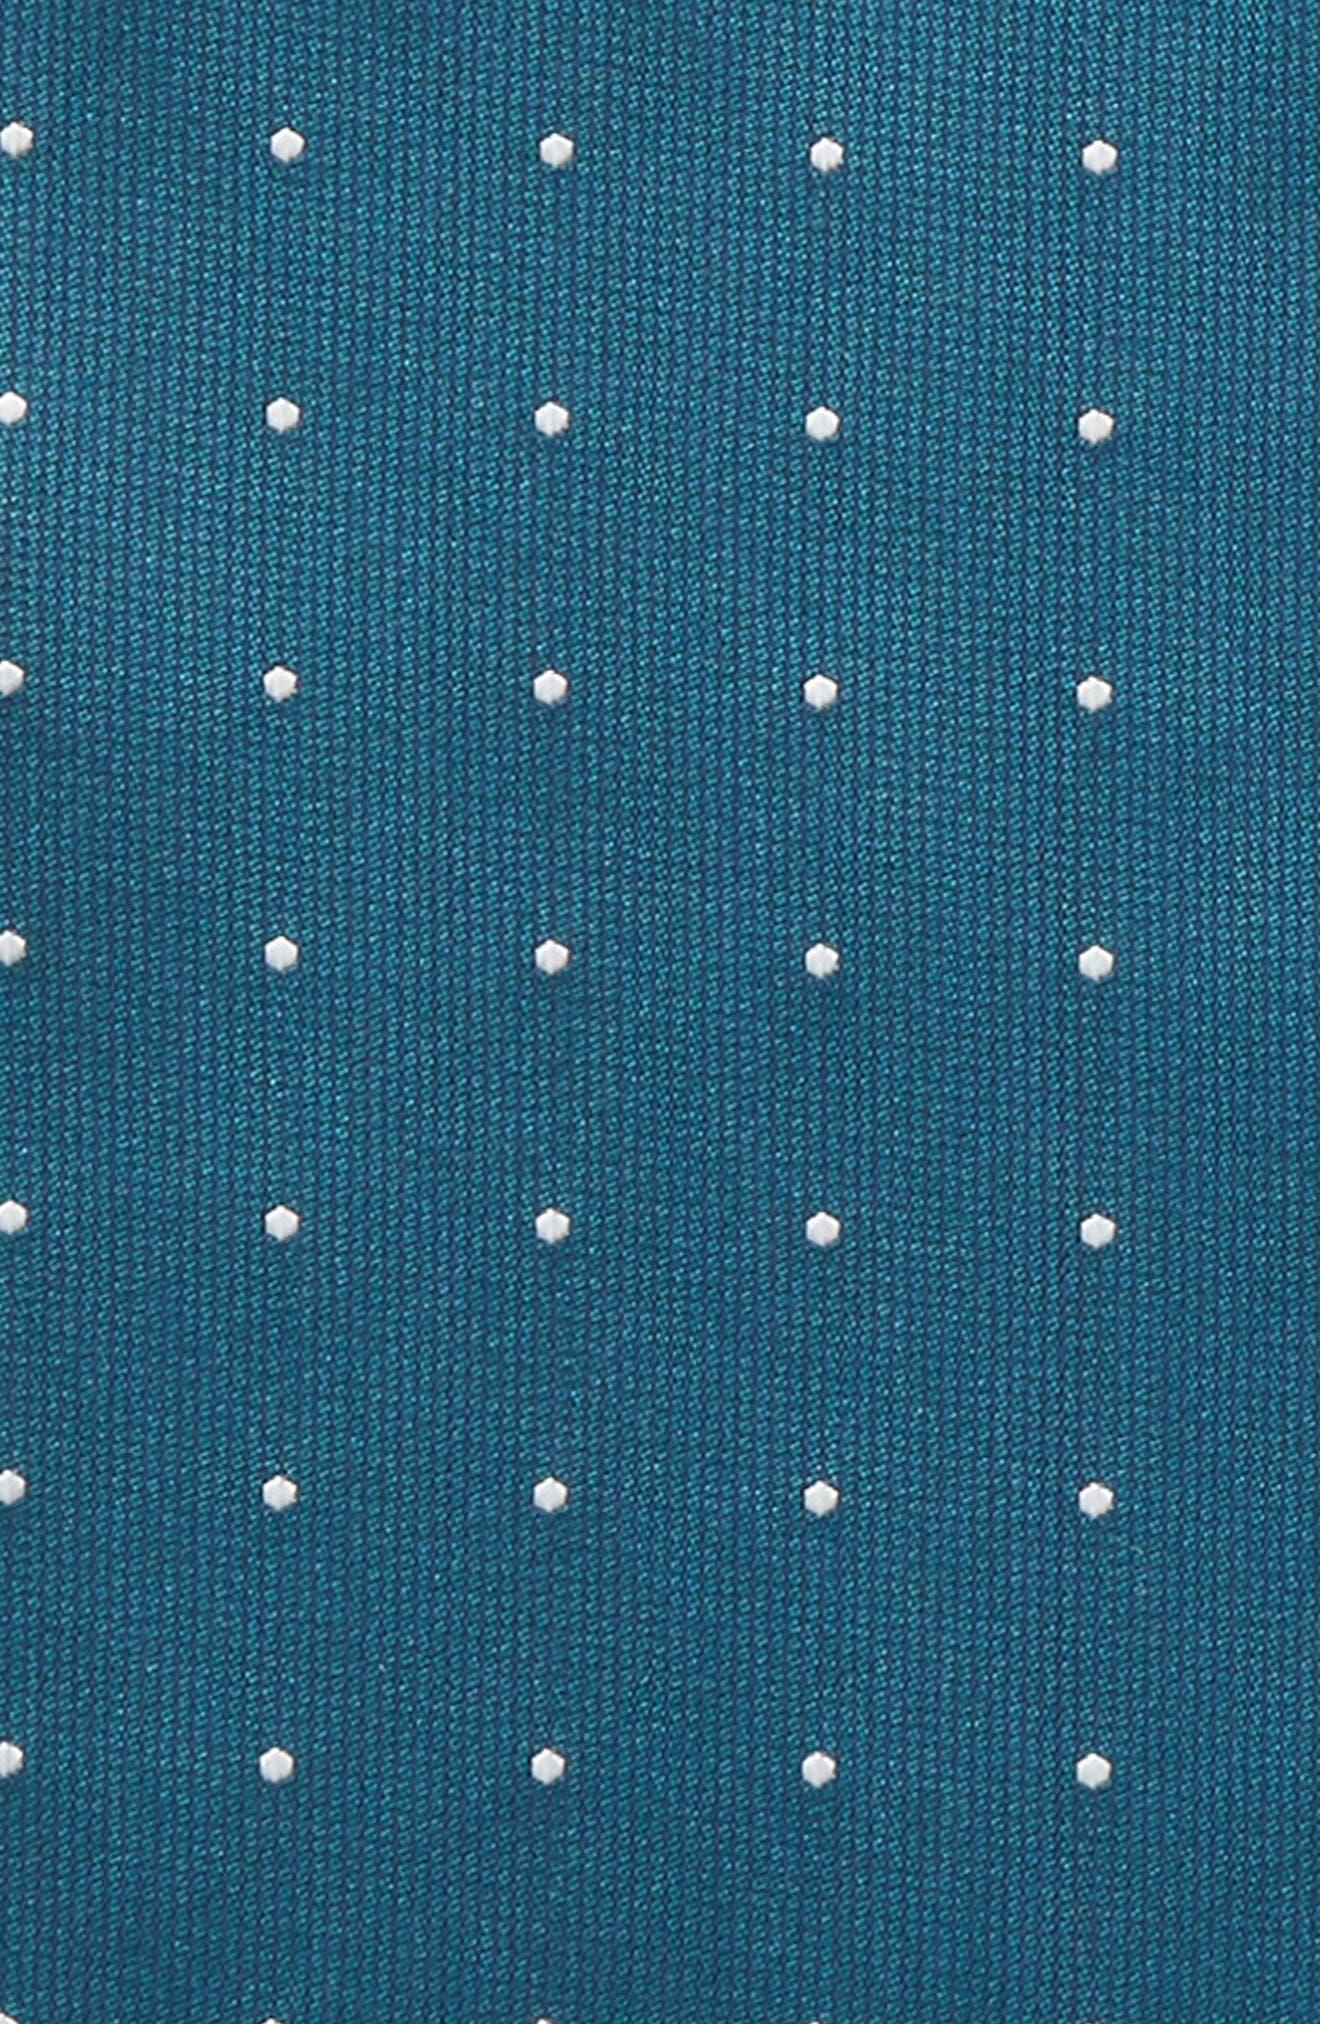 Dot Silk Pocket Square,                             Alternate thumbnail 3, color,                             Teal